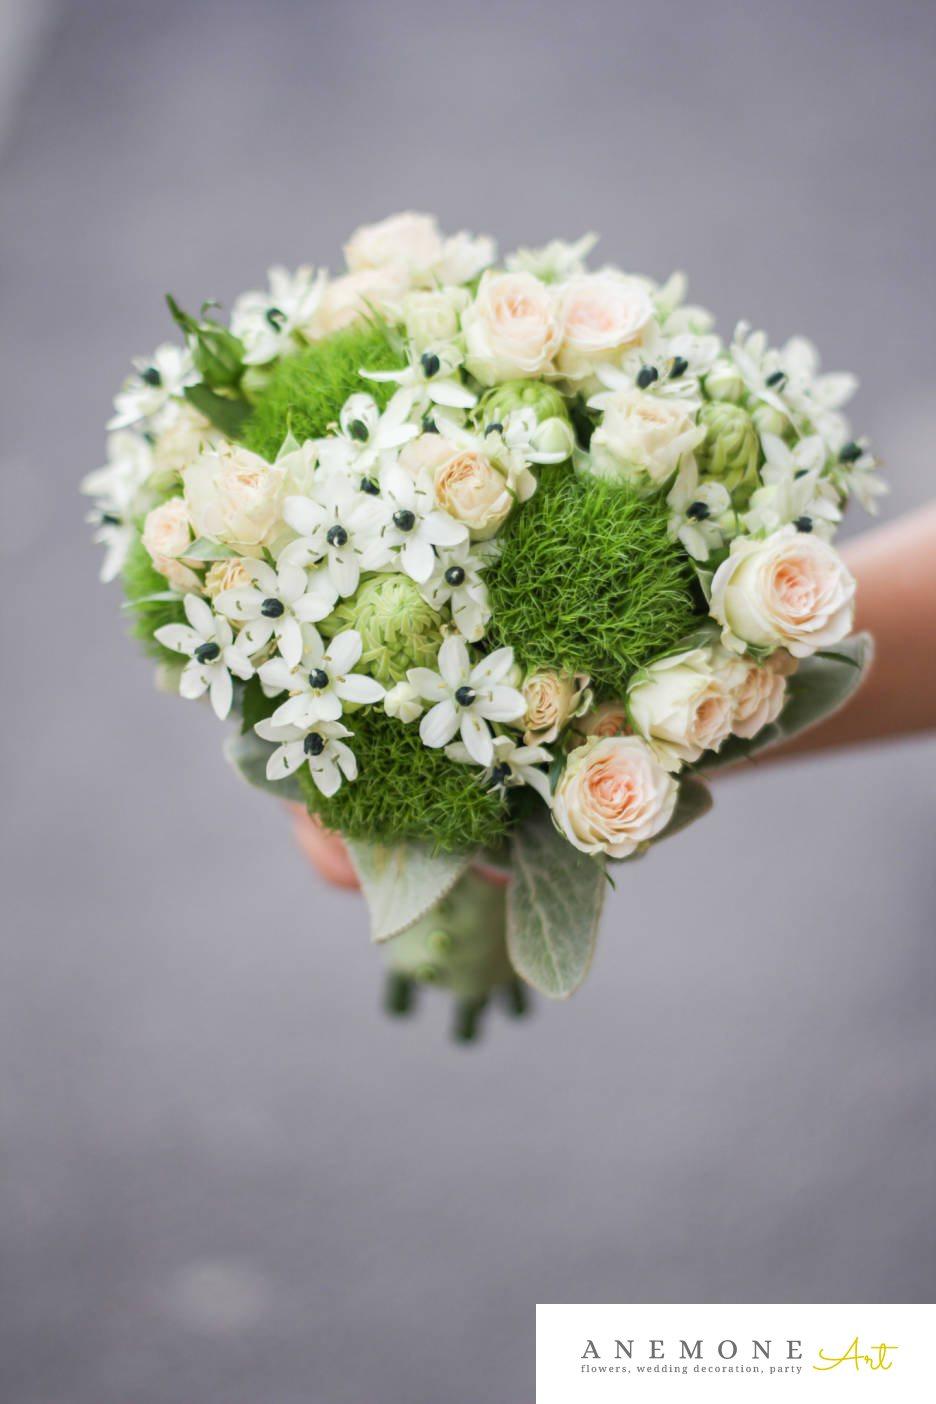 Poza, foto cu Flori de nunta alb, buchet mireasa, mini-rosa, muschi, ornitogallum, rotund, verde in Arad, Timisoara, Oradea (wedding flowers, bouquets) nunta Arad, Timisoara, Oradea